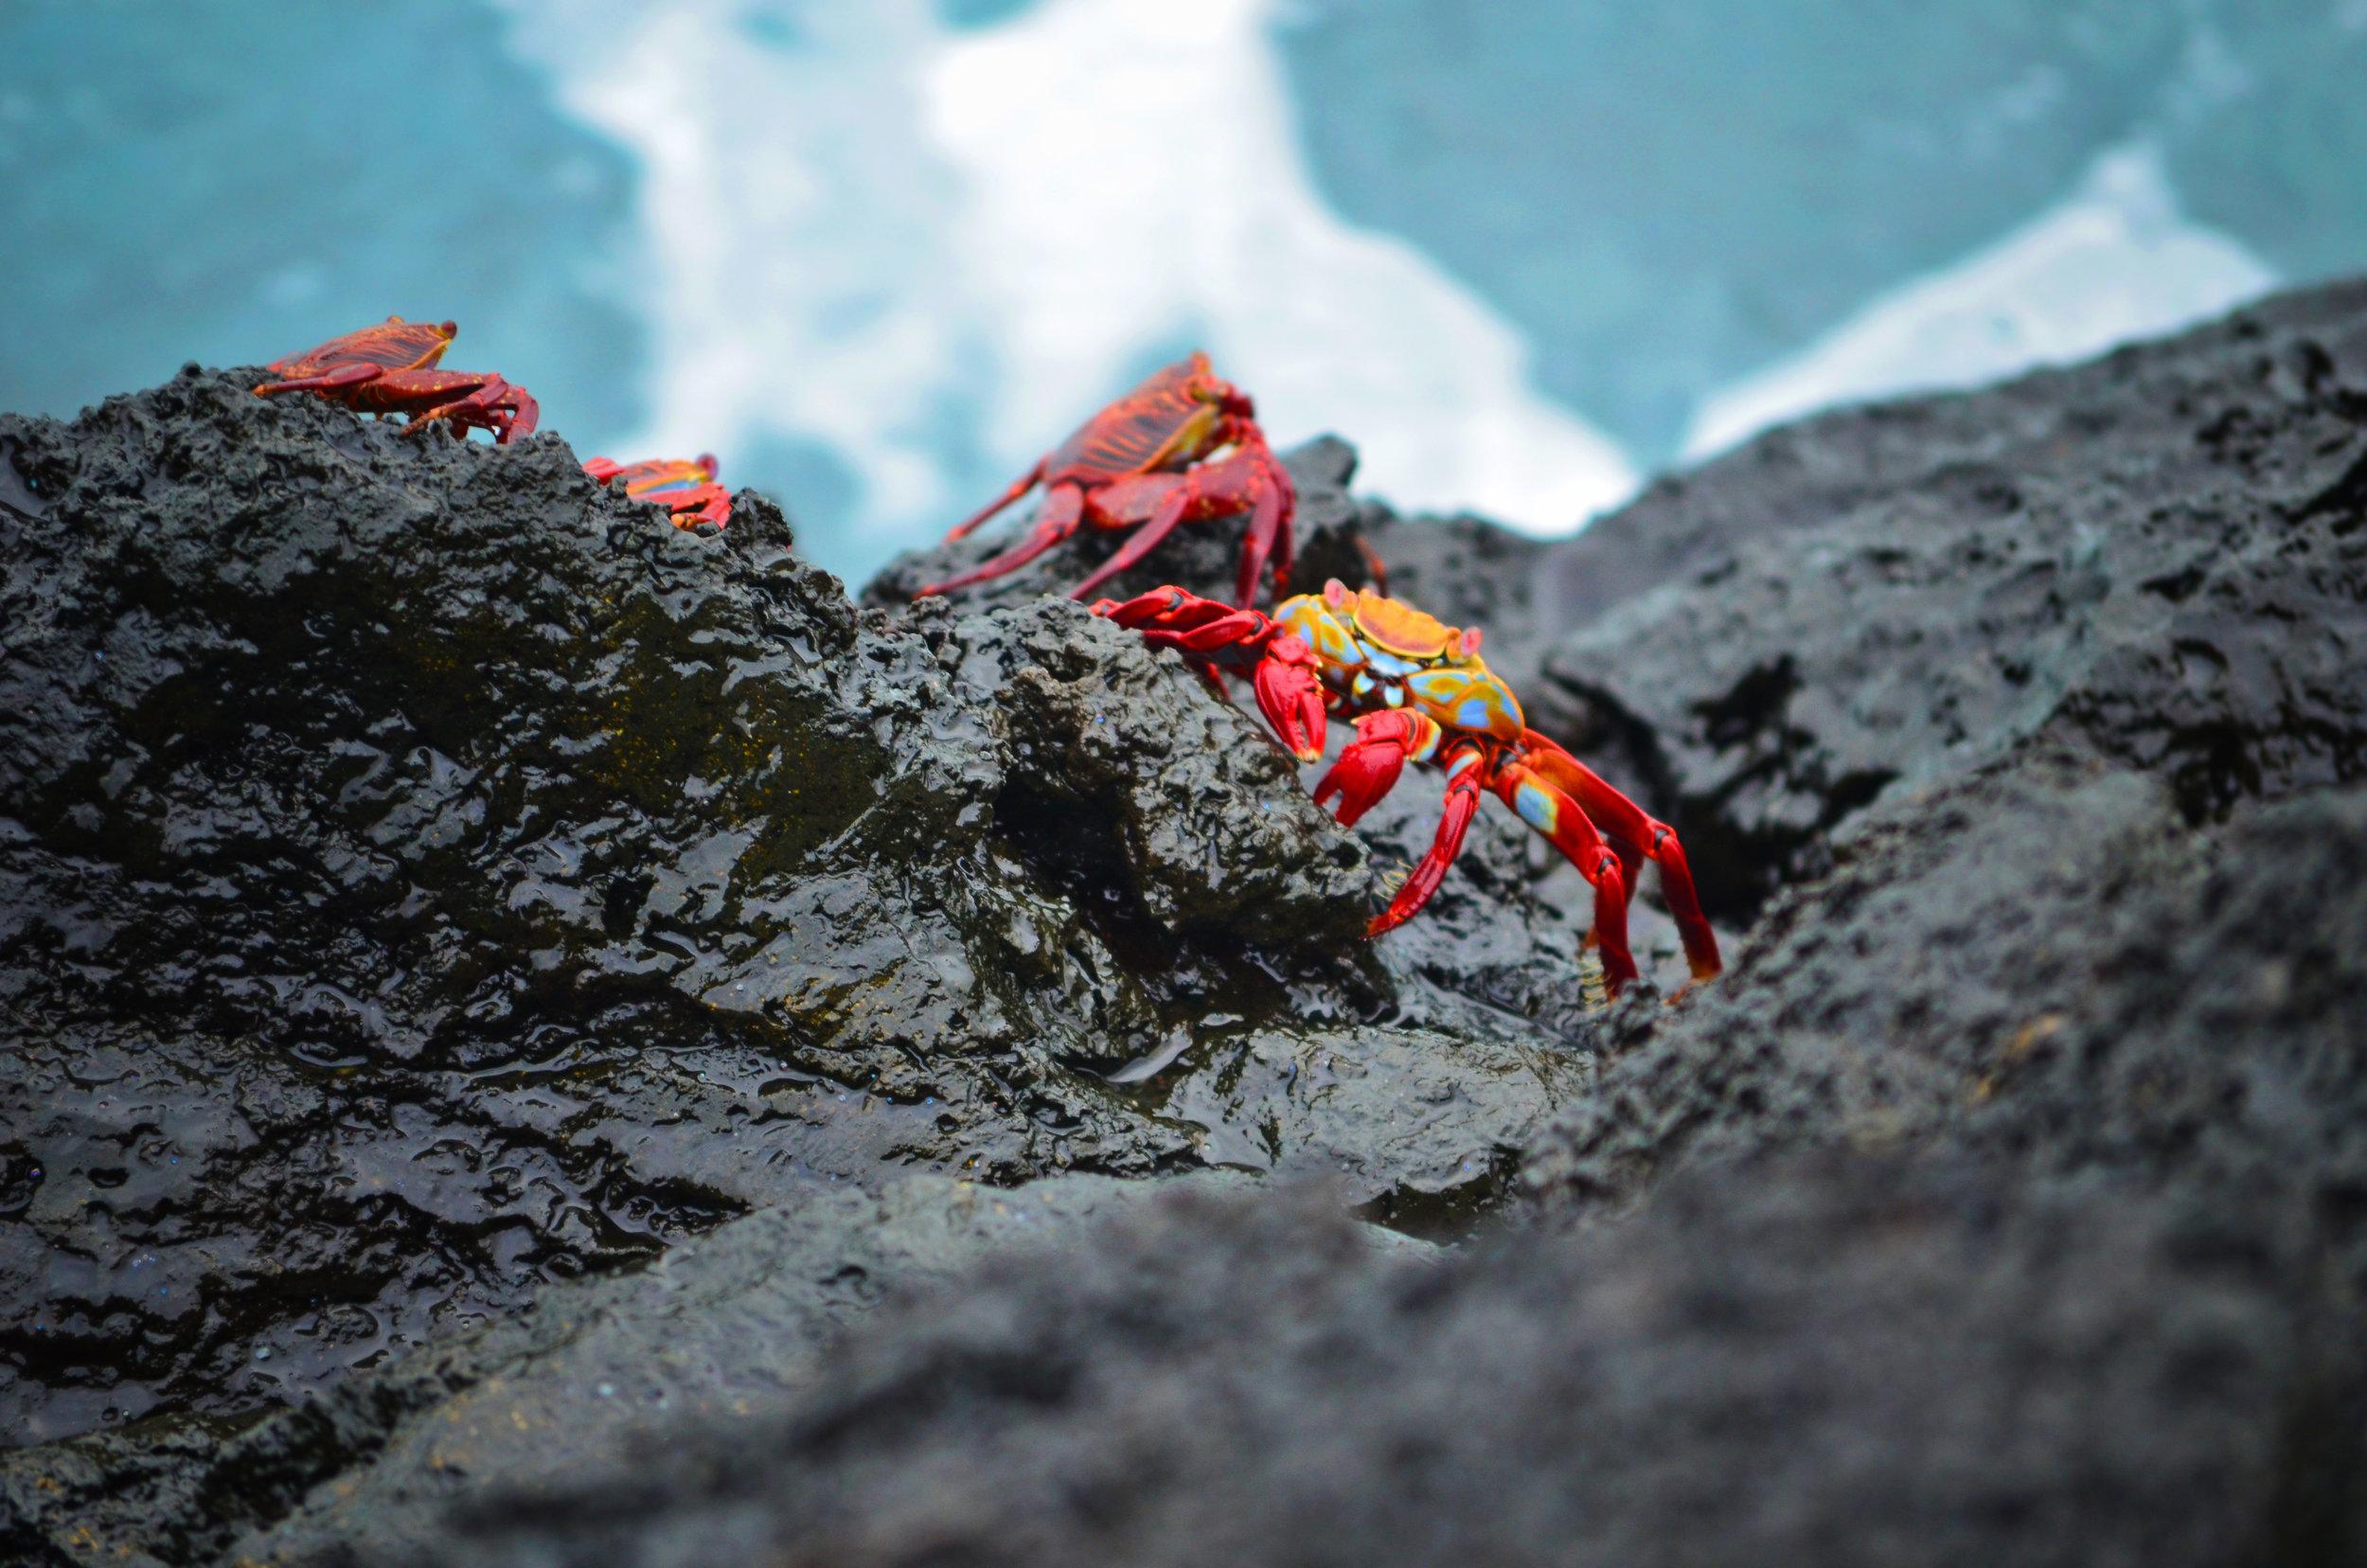 Sally lightfoot crabs cling to volcanic rock as waves crash over them on San Cristóbal Island